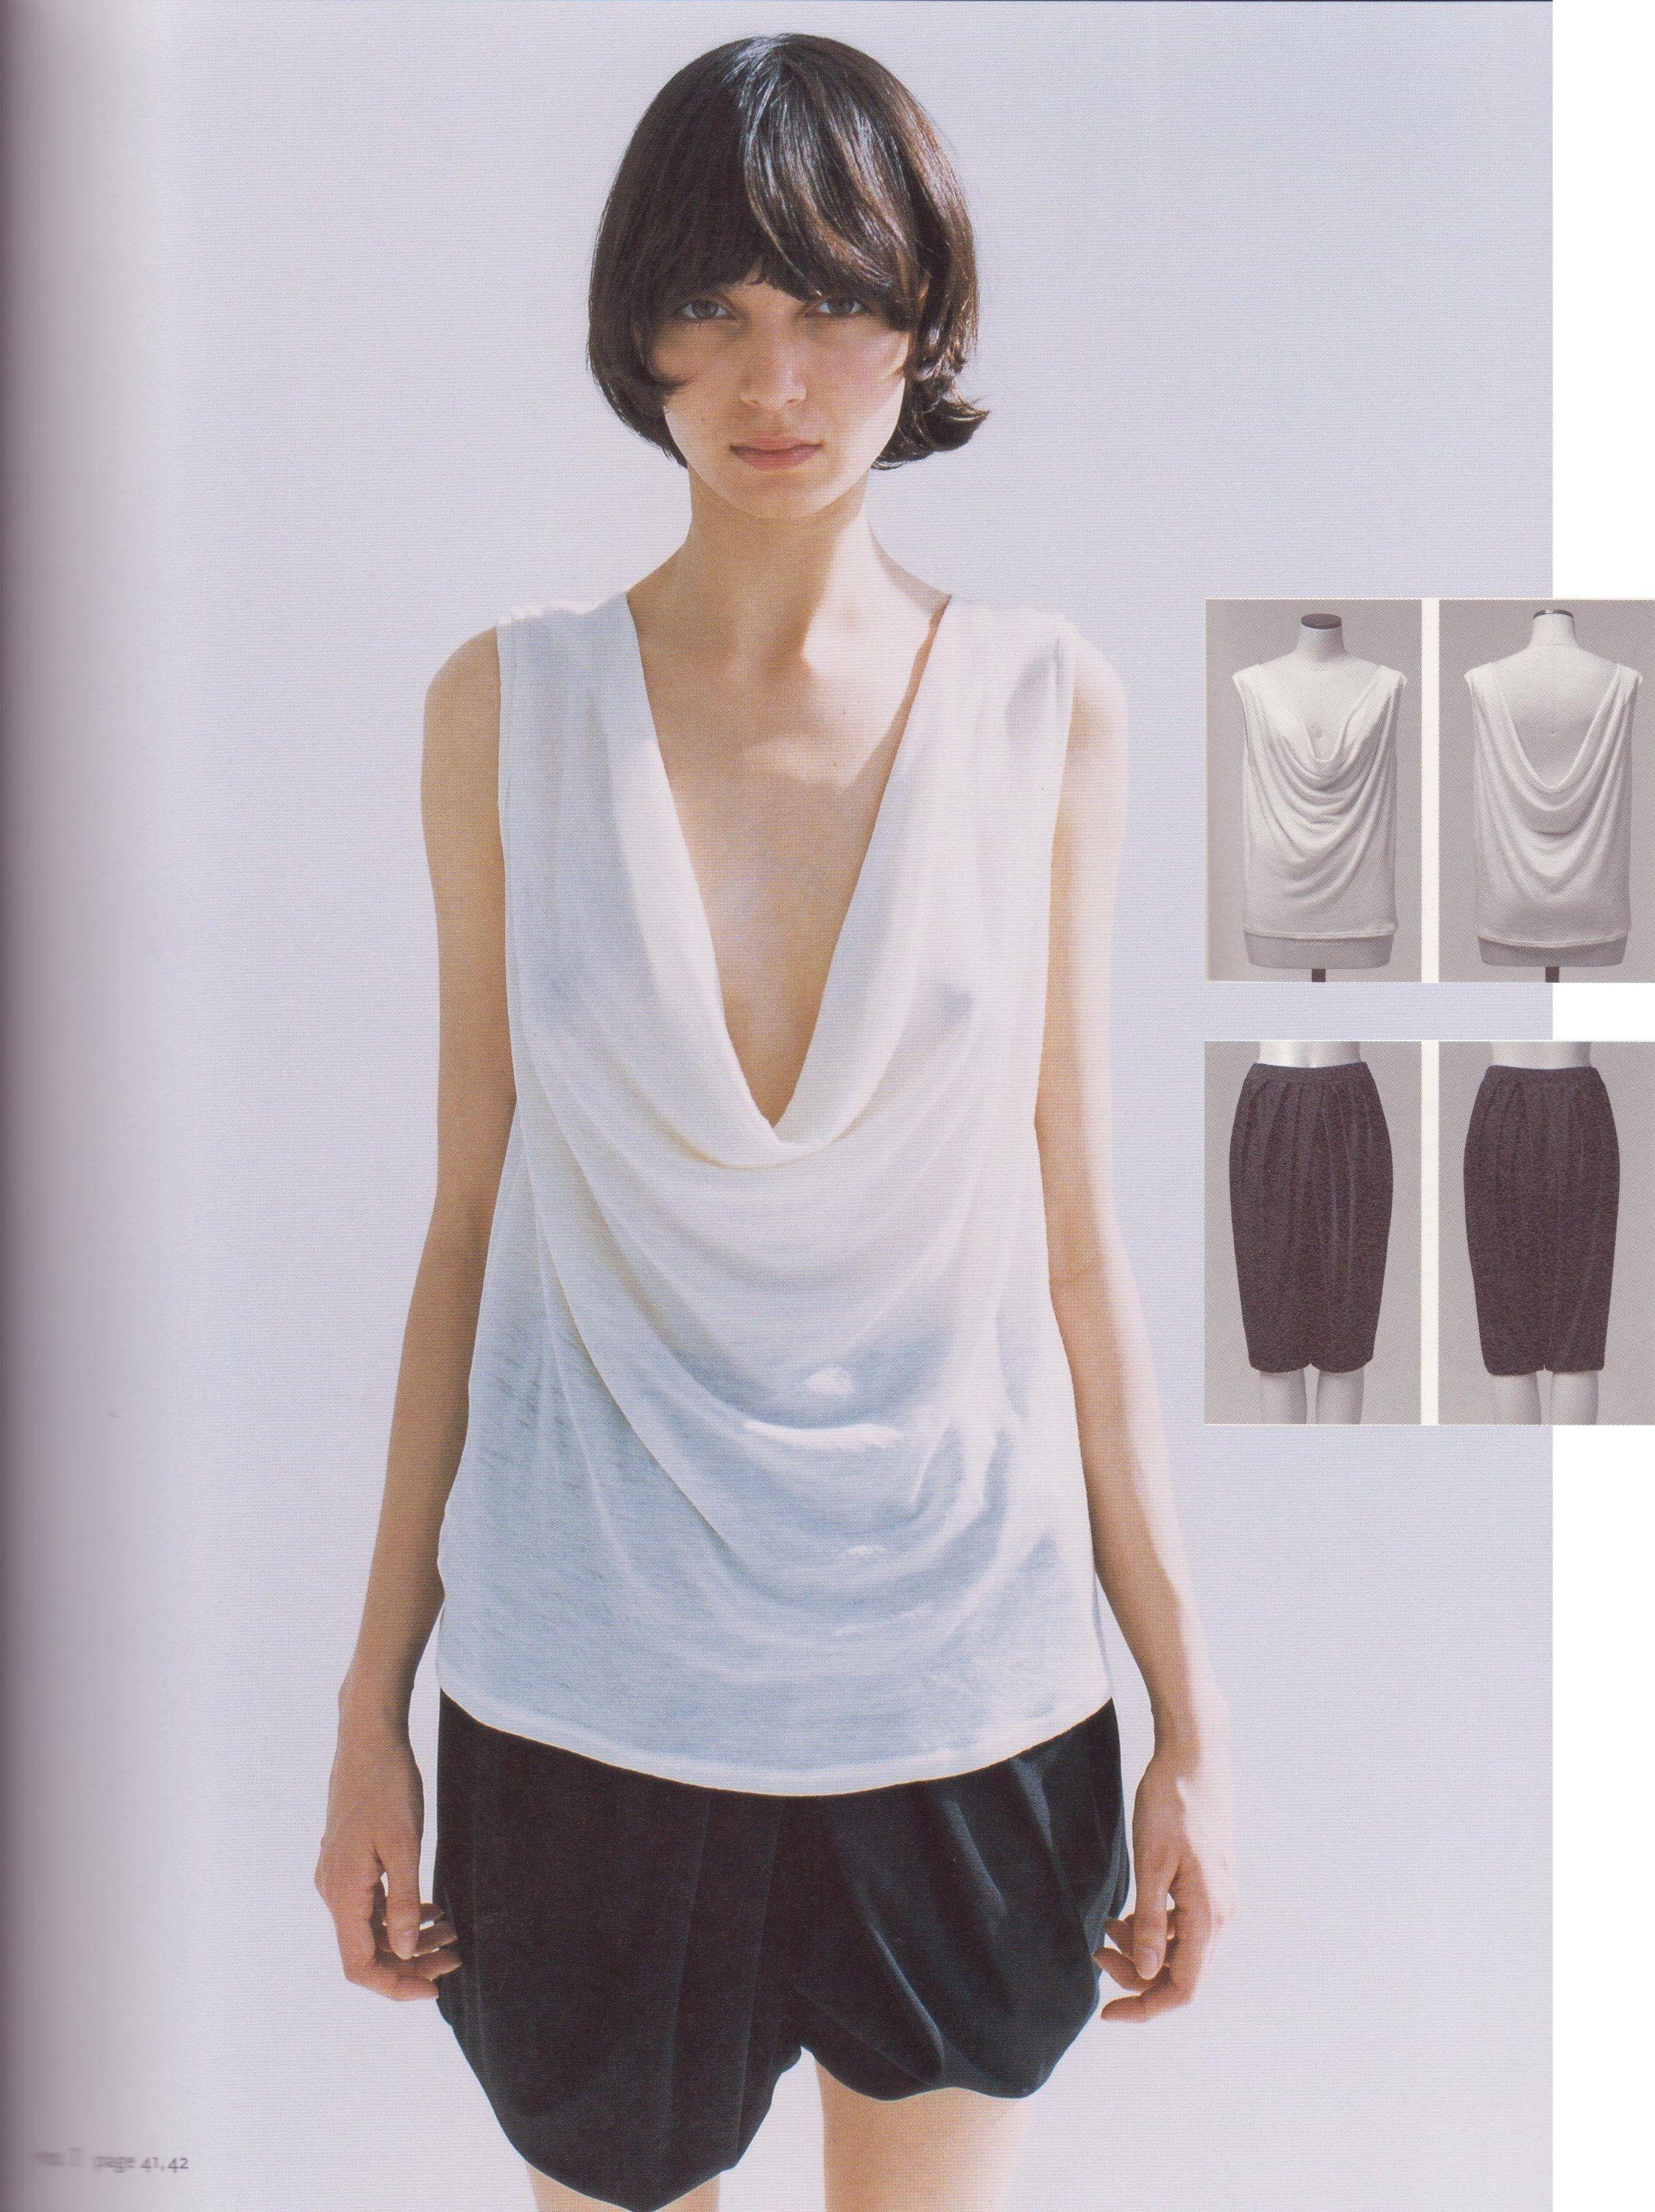 drape-drape-no-1-loose-drape-top-and-tuck-drape-pants.jpg (2248×3004 ...